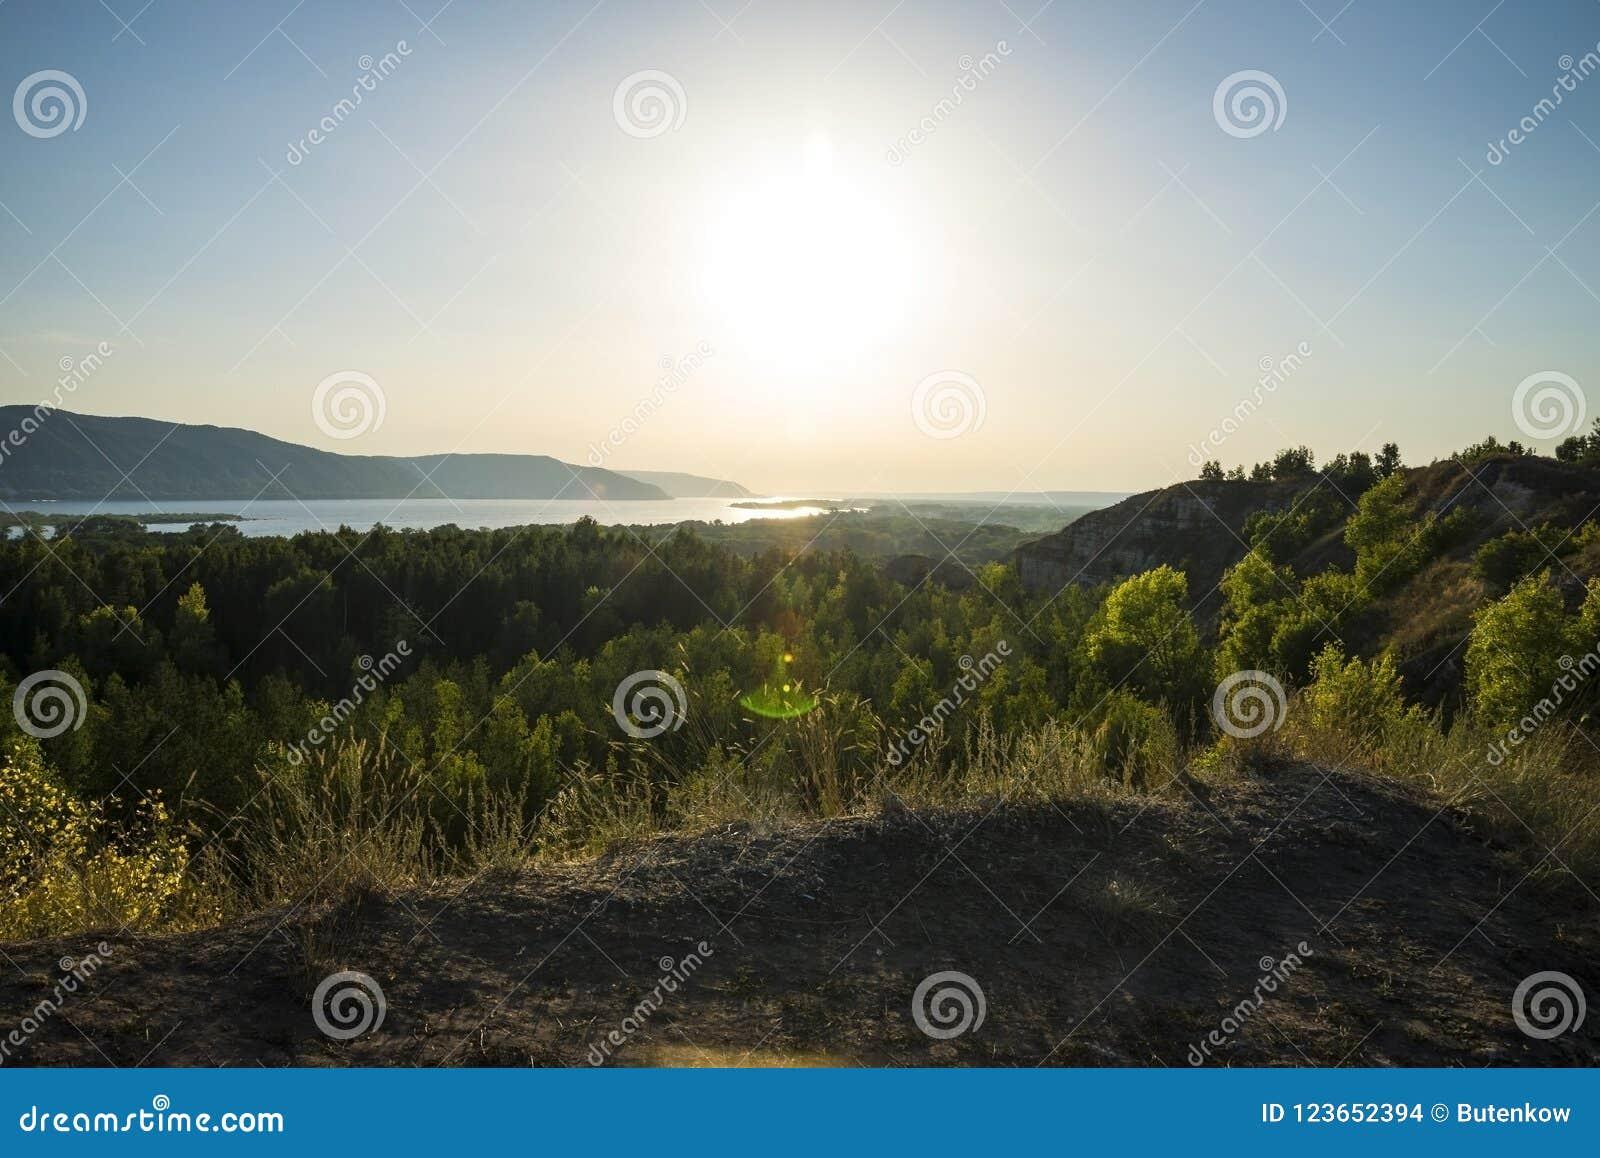 Tsarev Kurgan, Samara: description, location and interesting facts 43